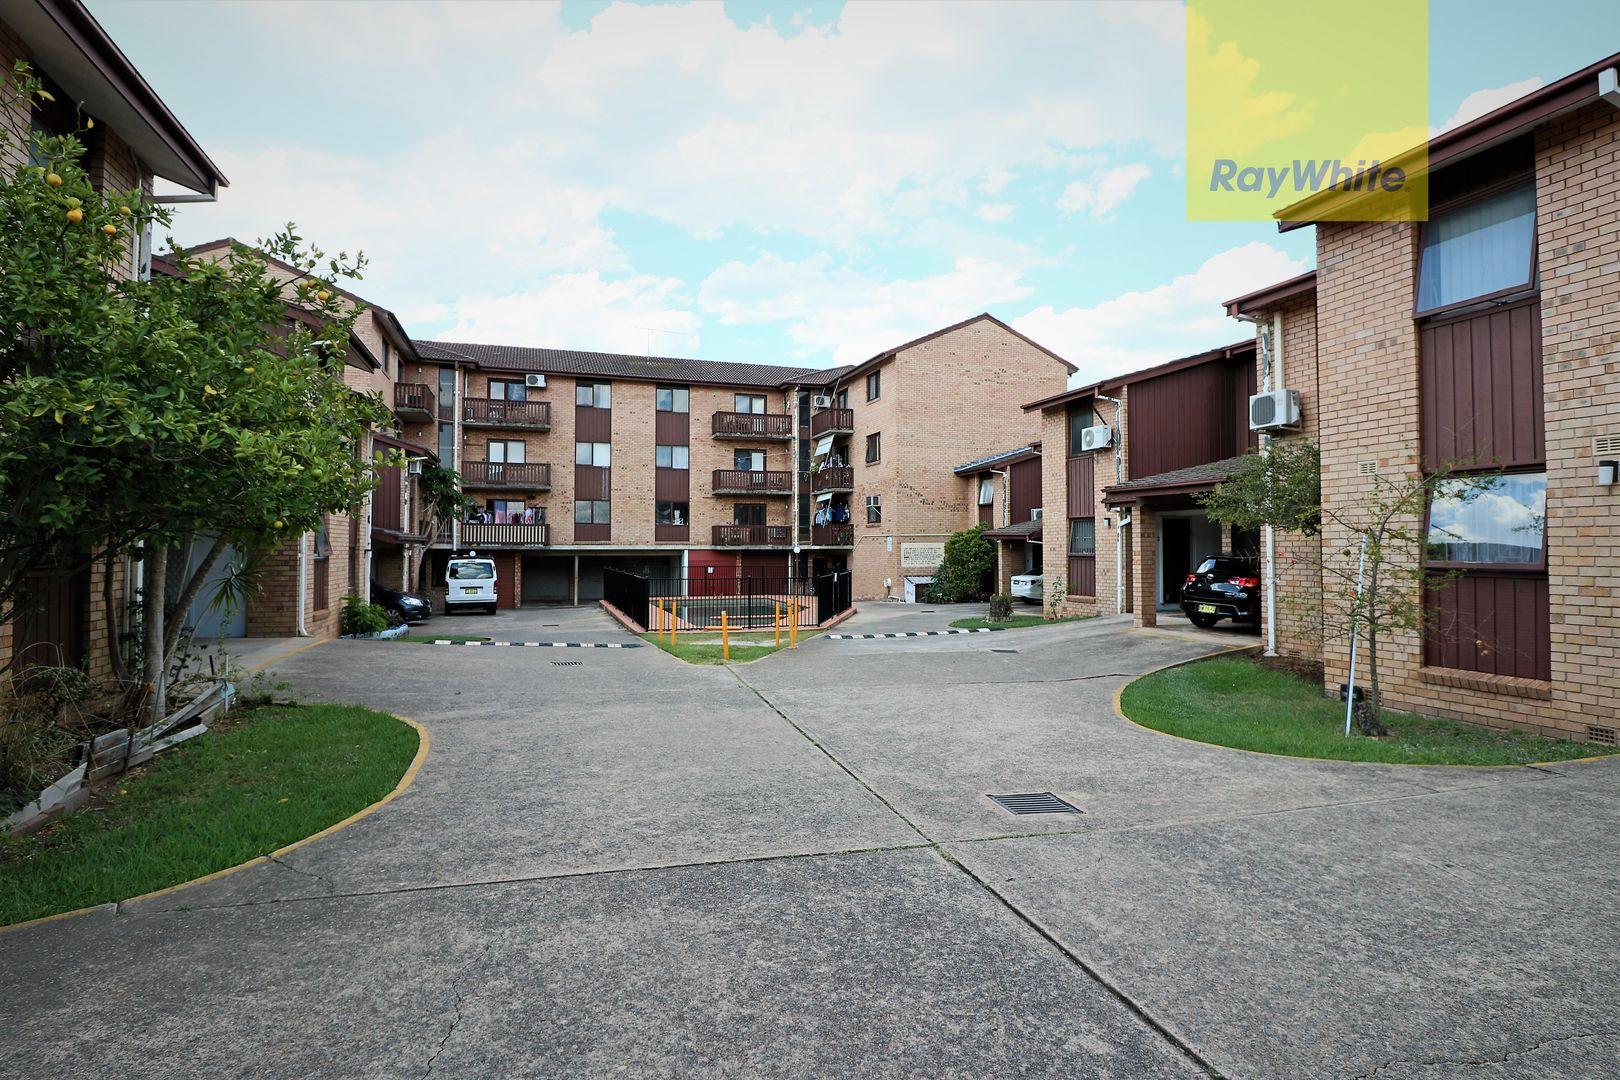 20/3-5 Gilbert Street, Cabramatta NSW 2166, Image 0